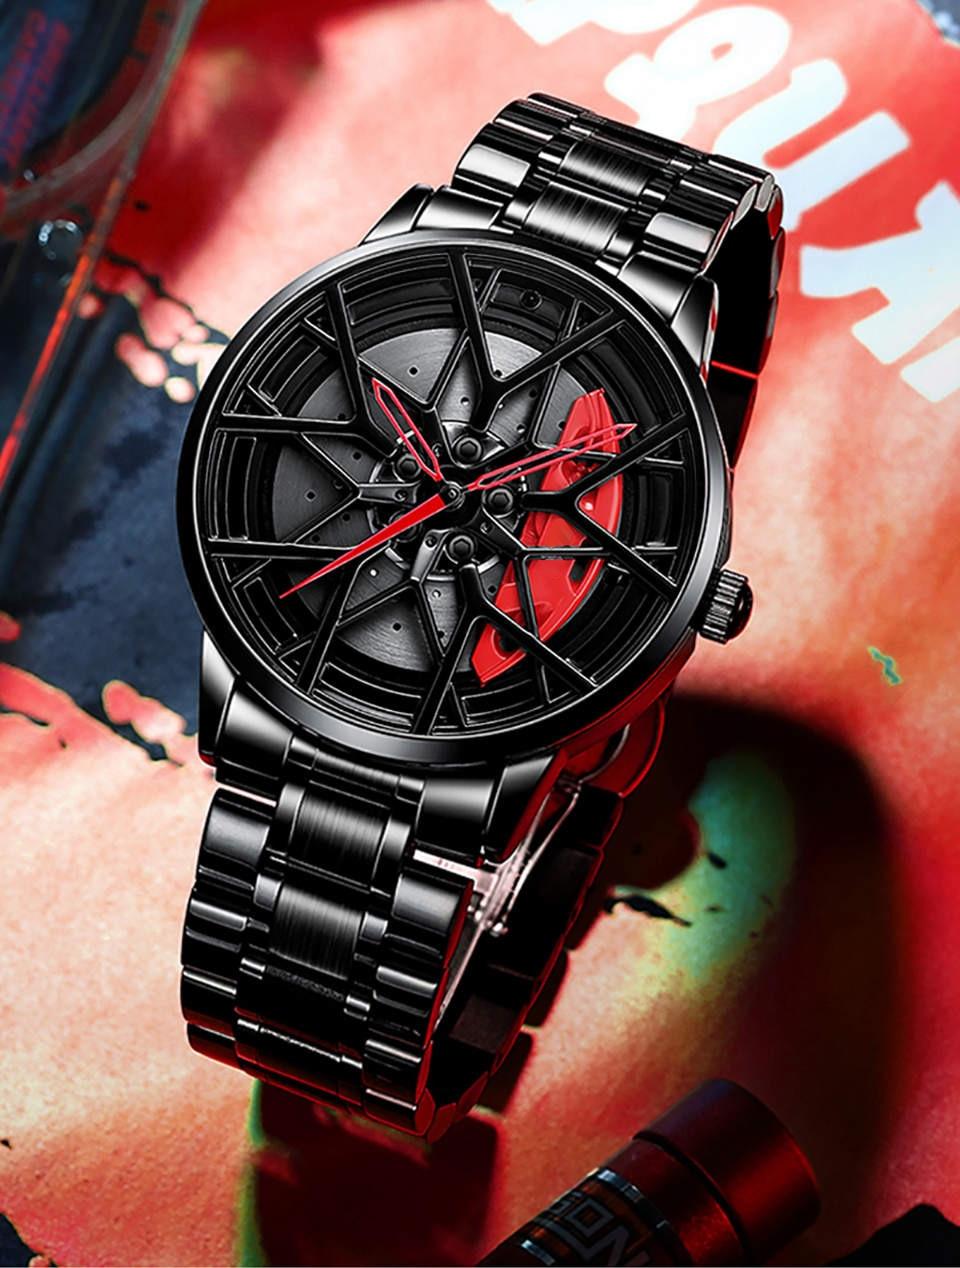 Hb8369637e94647888a4d78f36b8a122bo NIBOSI 2020 Car Rim Hub Wheel Watch Custom Design